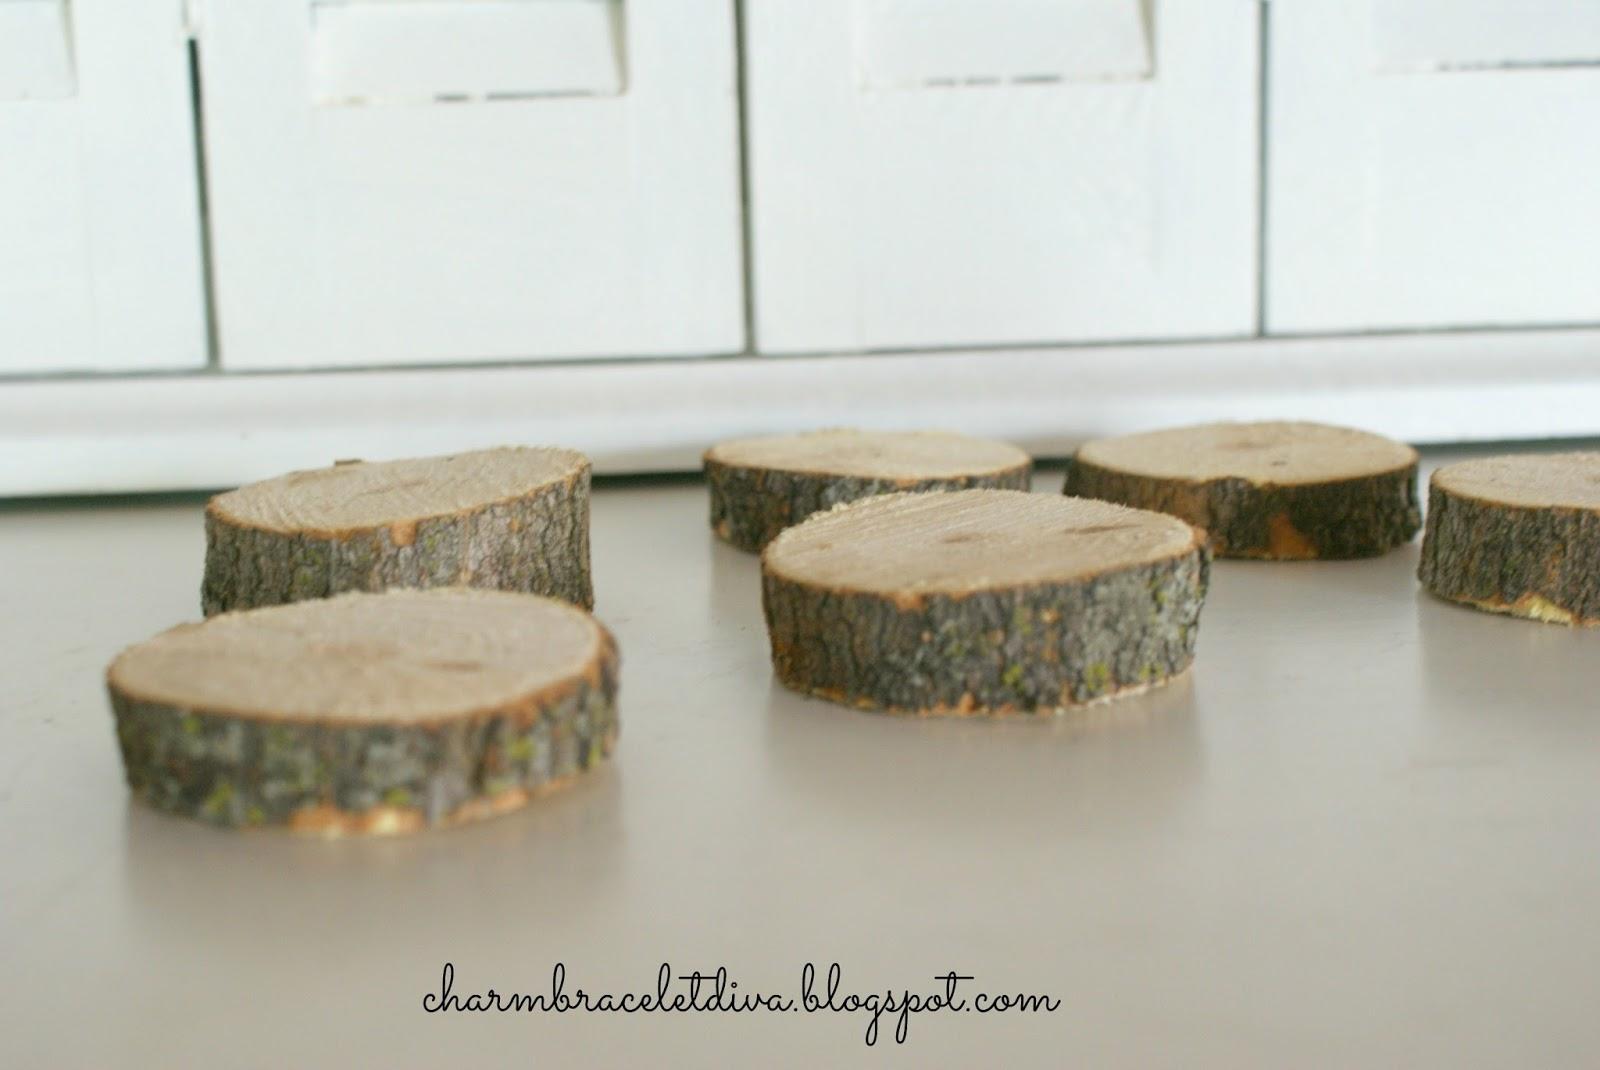 Our hopeful home diy rustic farmhouse wood slice coasters for Diy rustic coasters